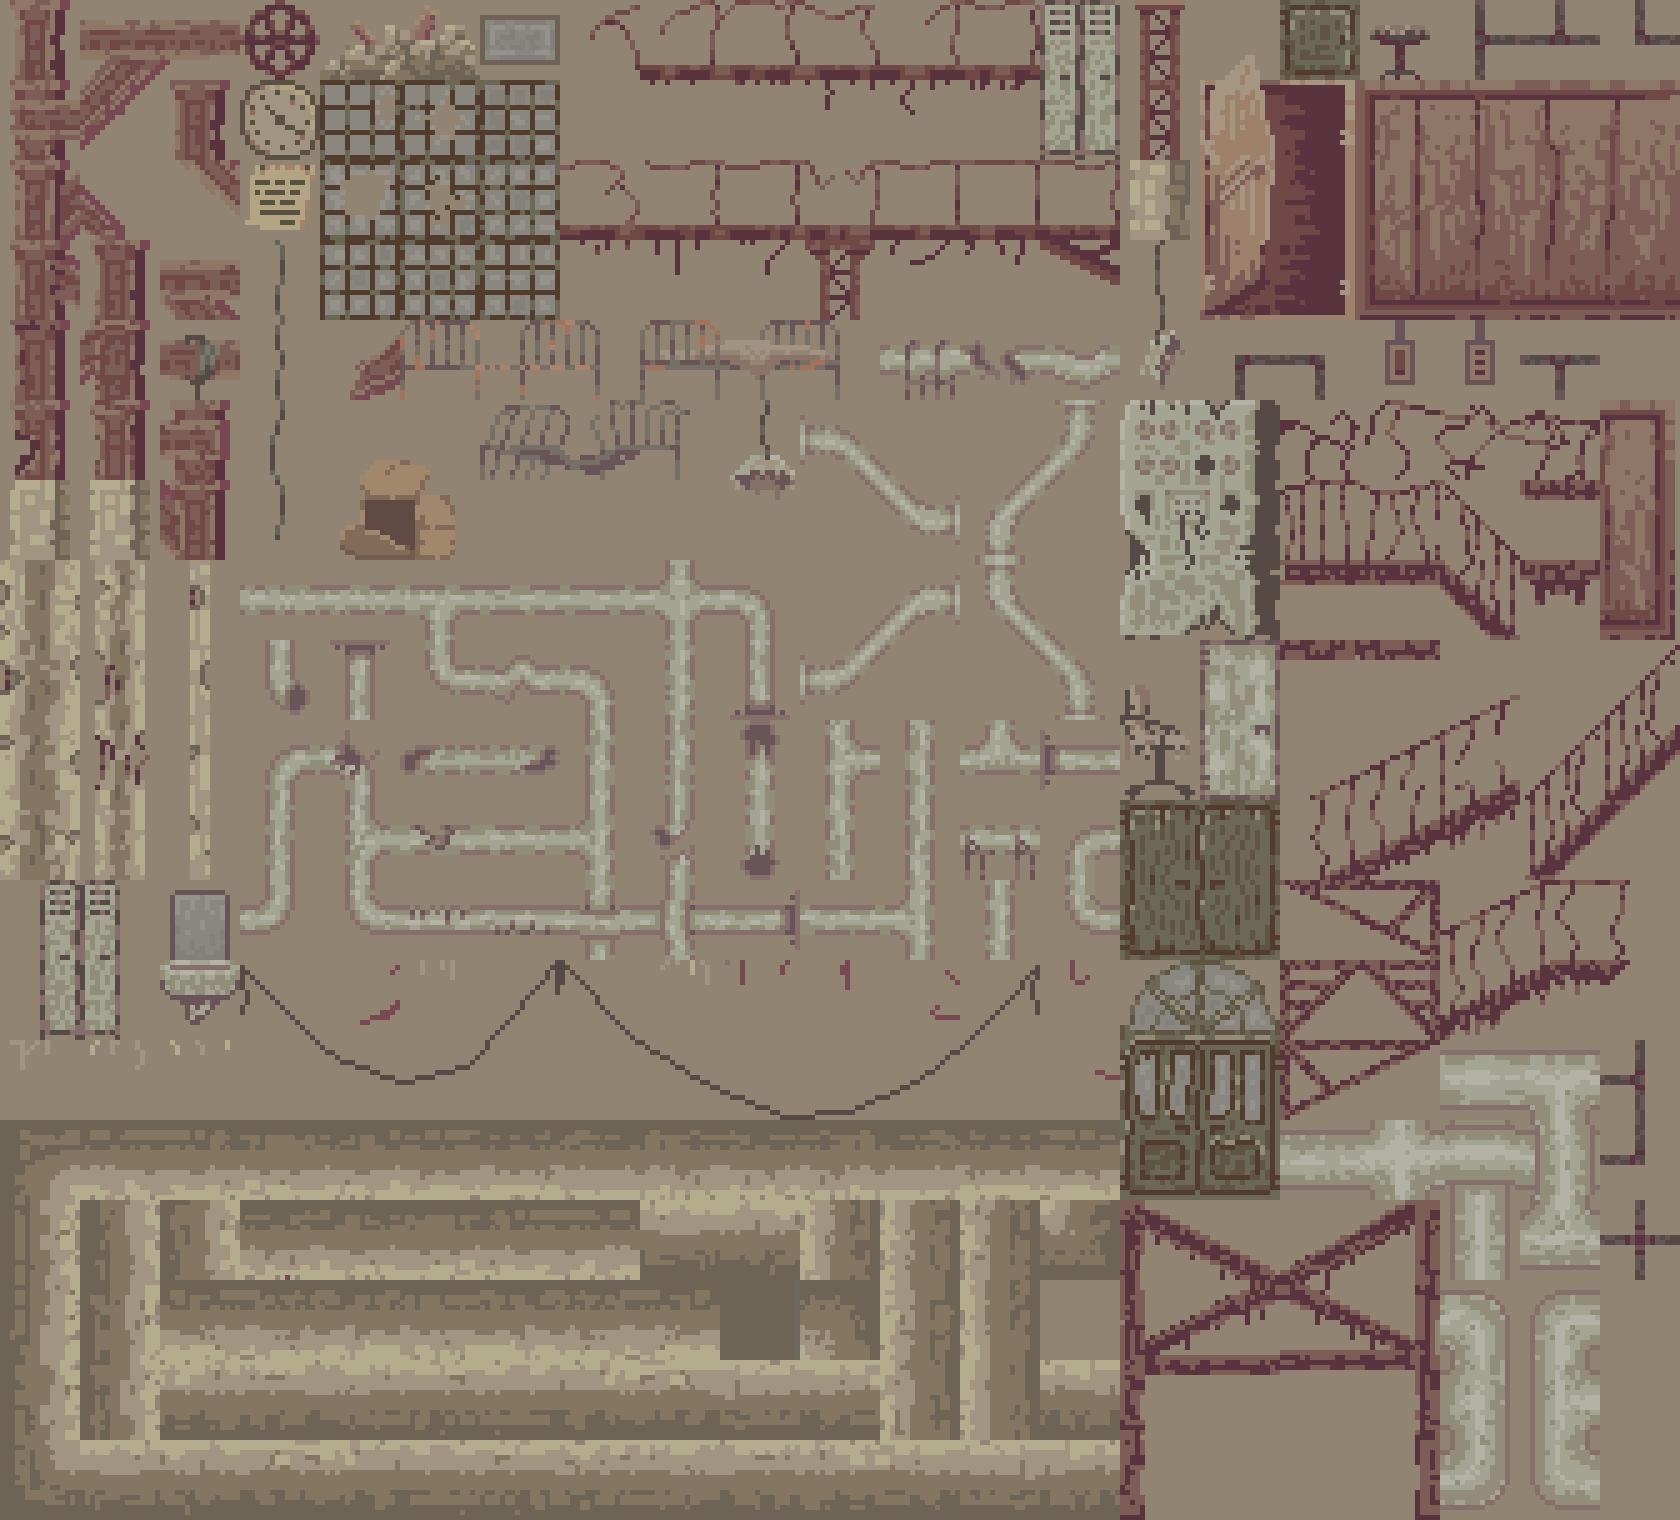 Pixel art abandoned factory tileset